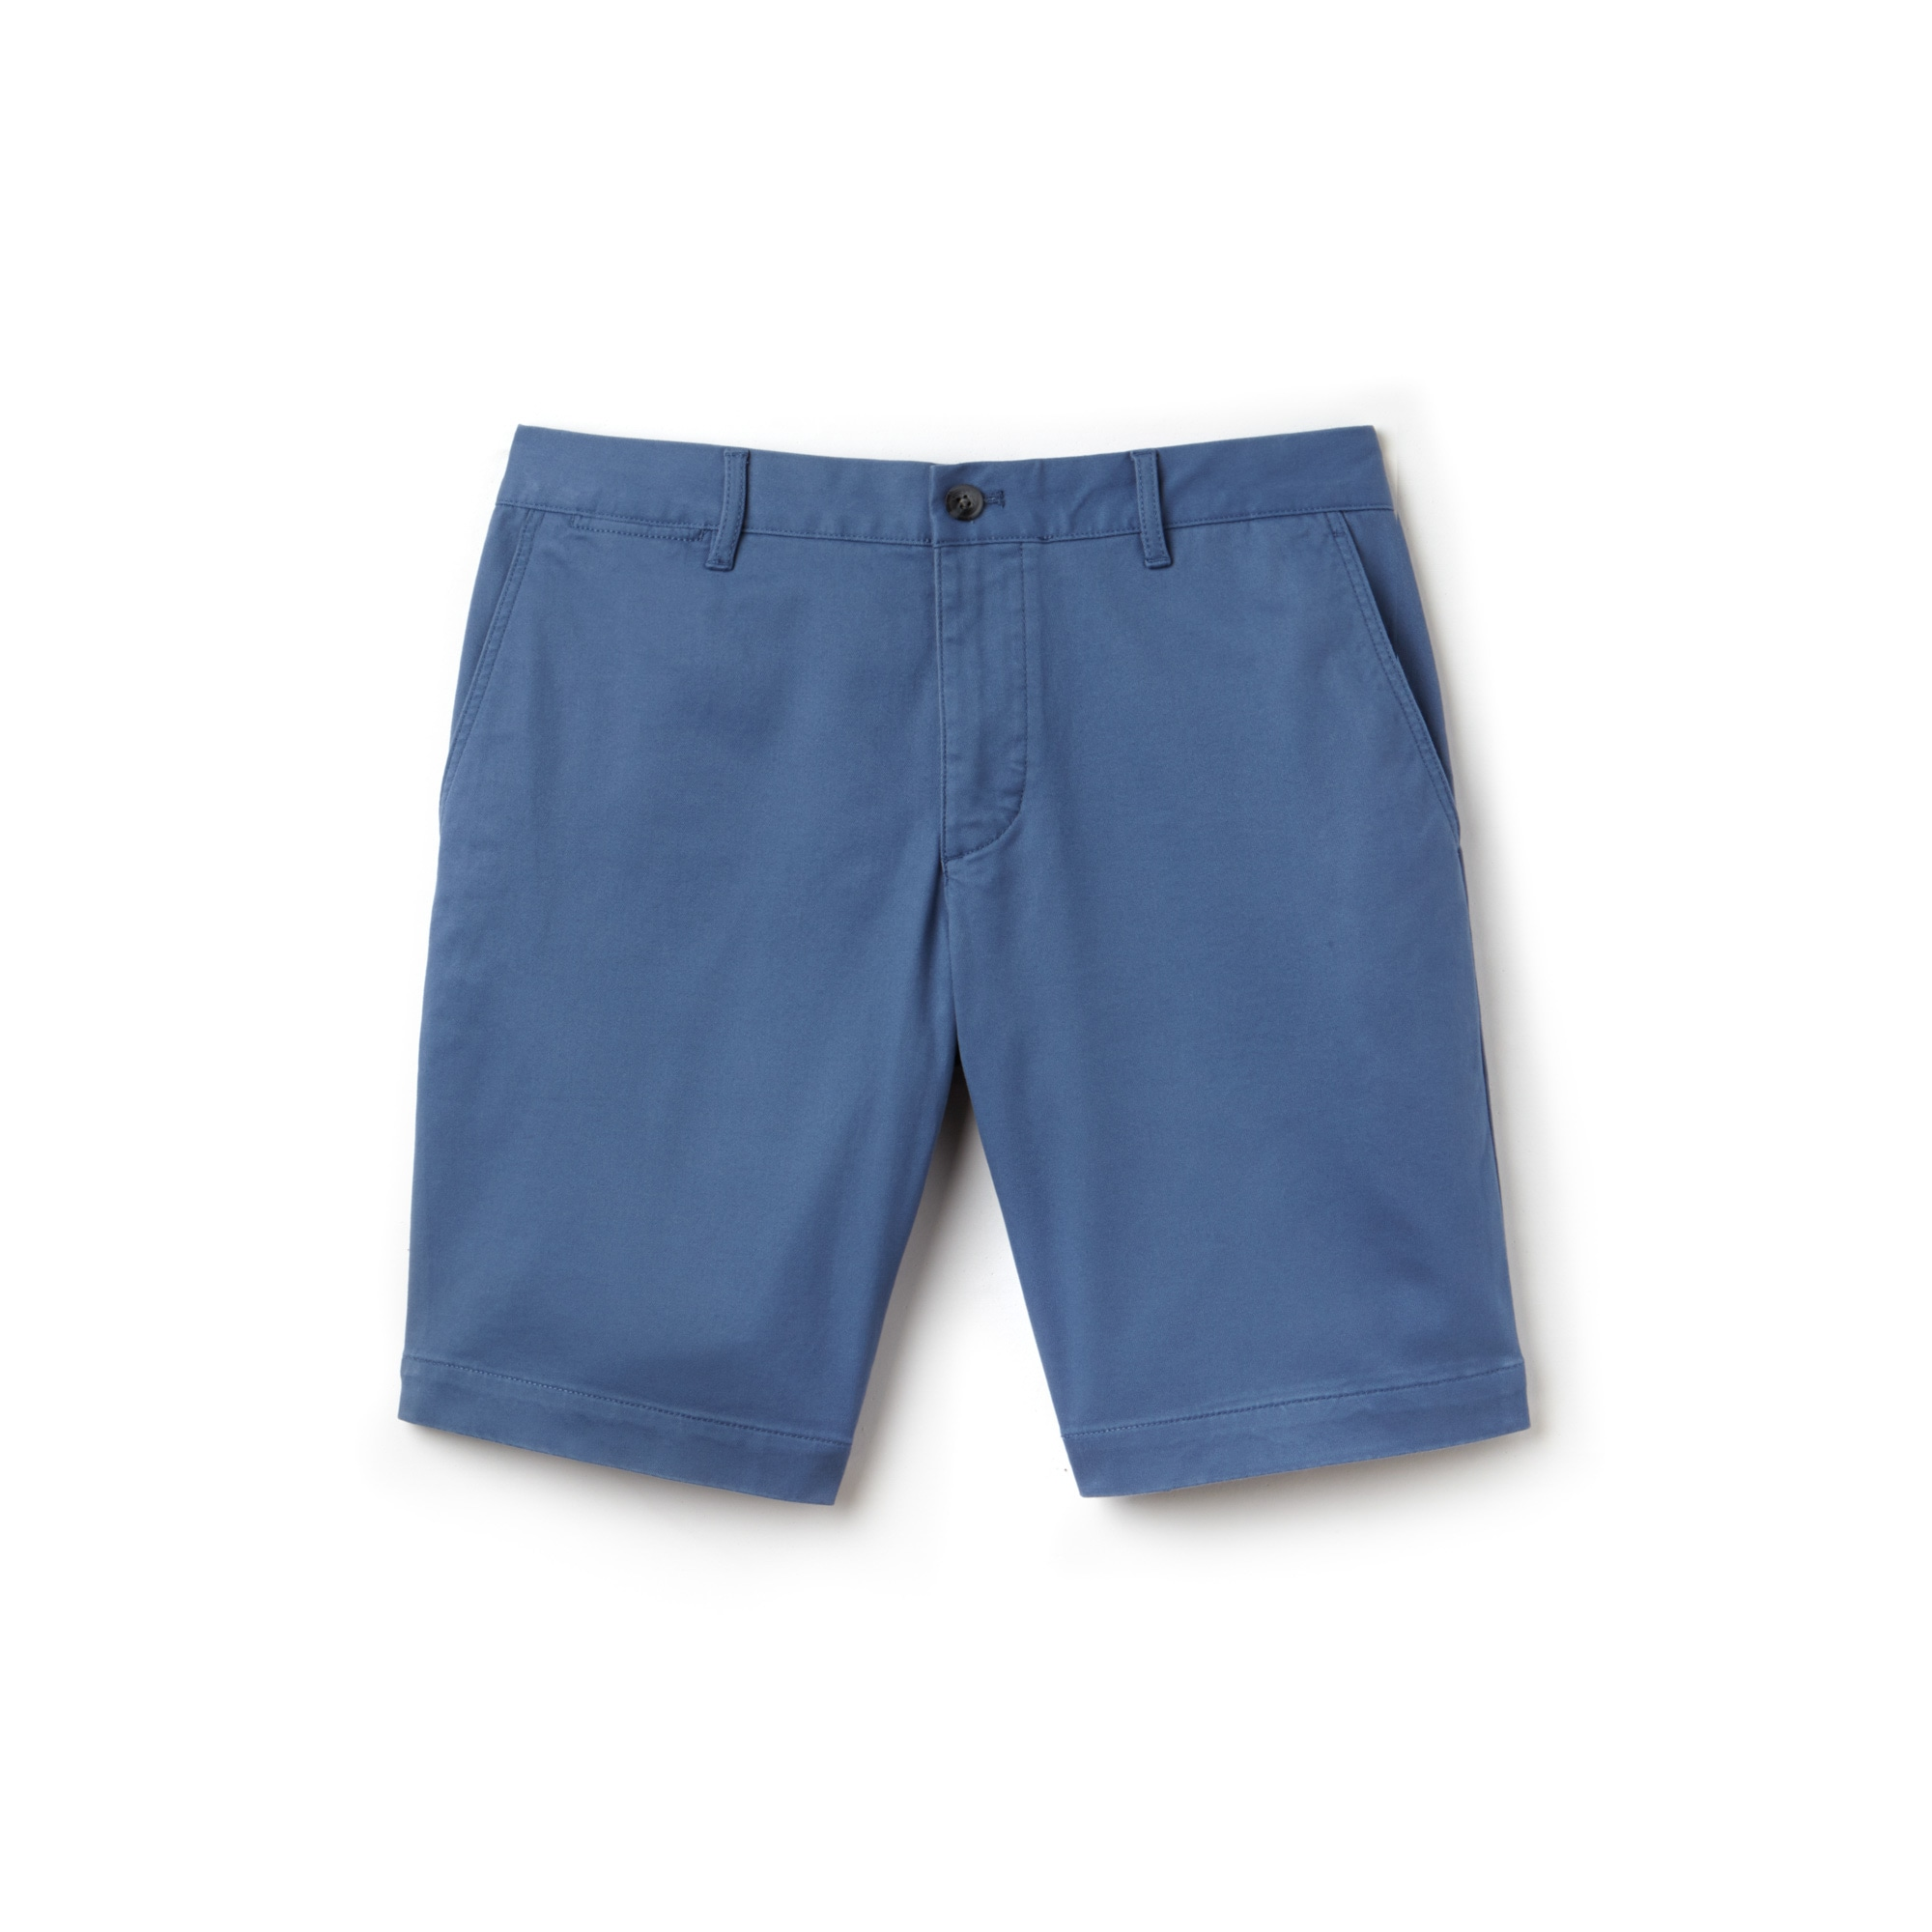 TROUSERS - Bermuda shorts Gabardine Clearance Sast rXK1J5B